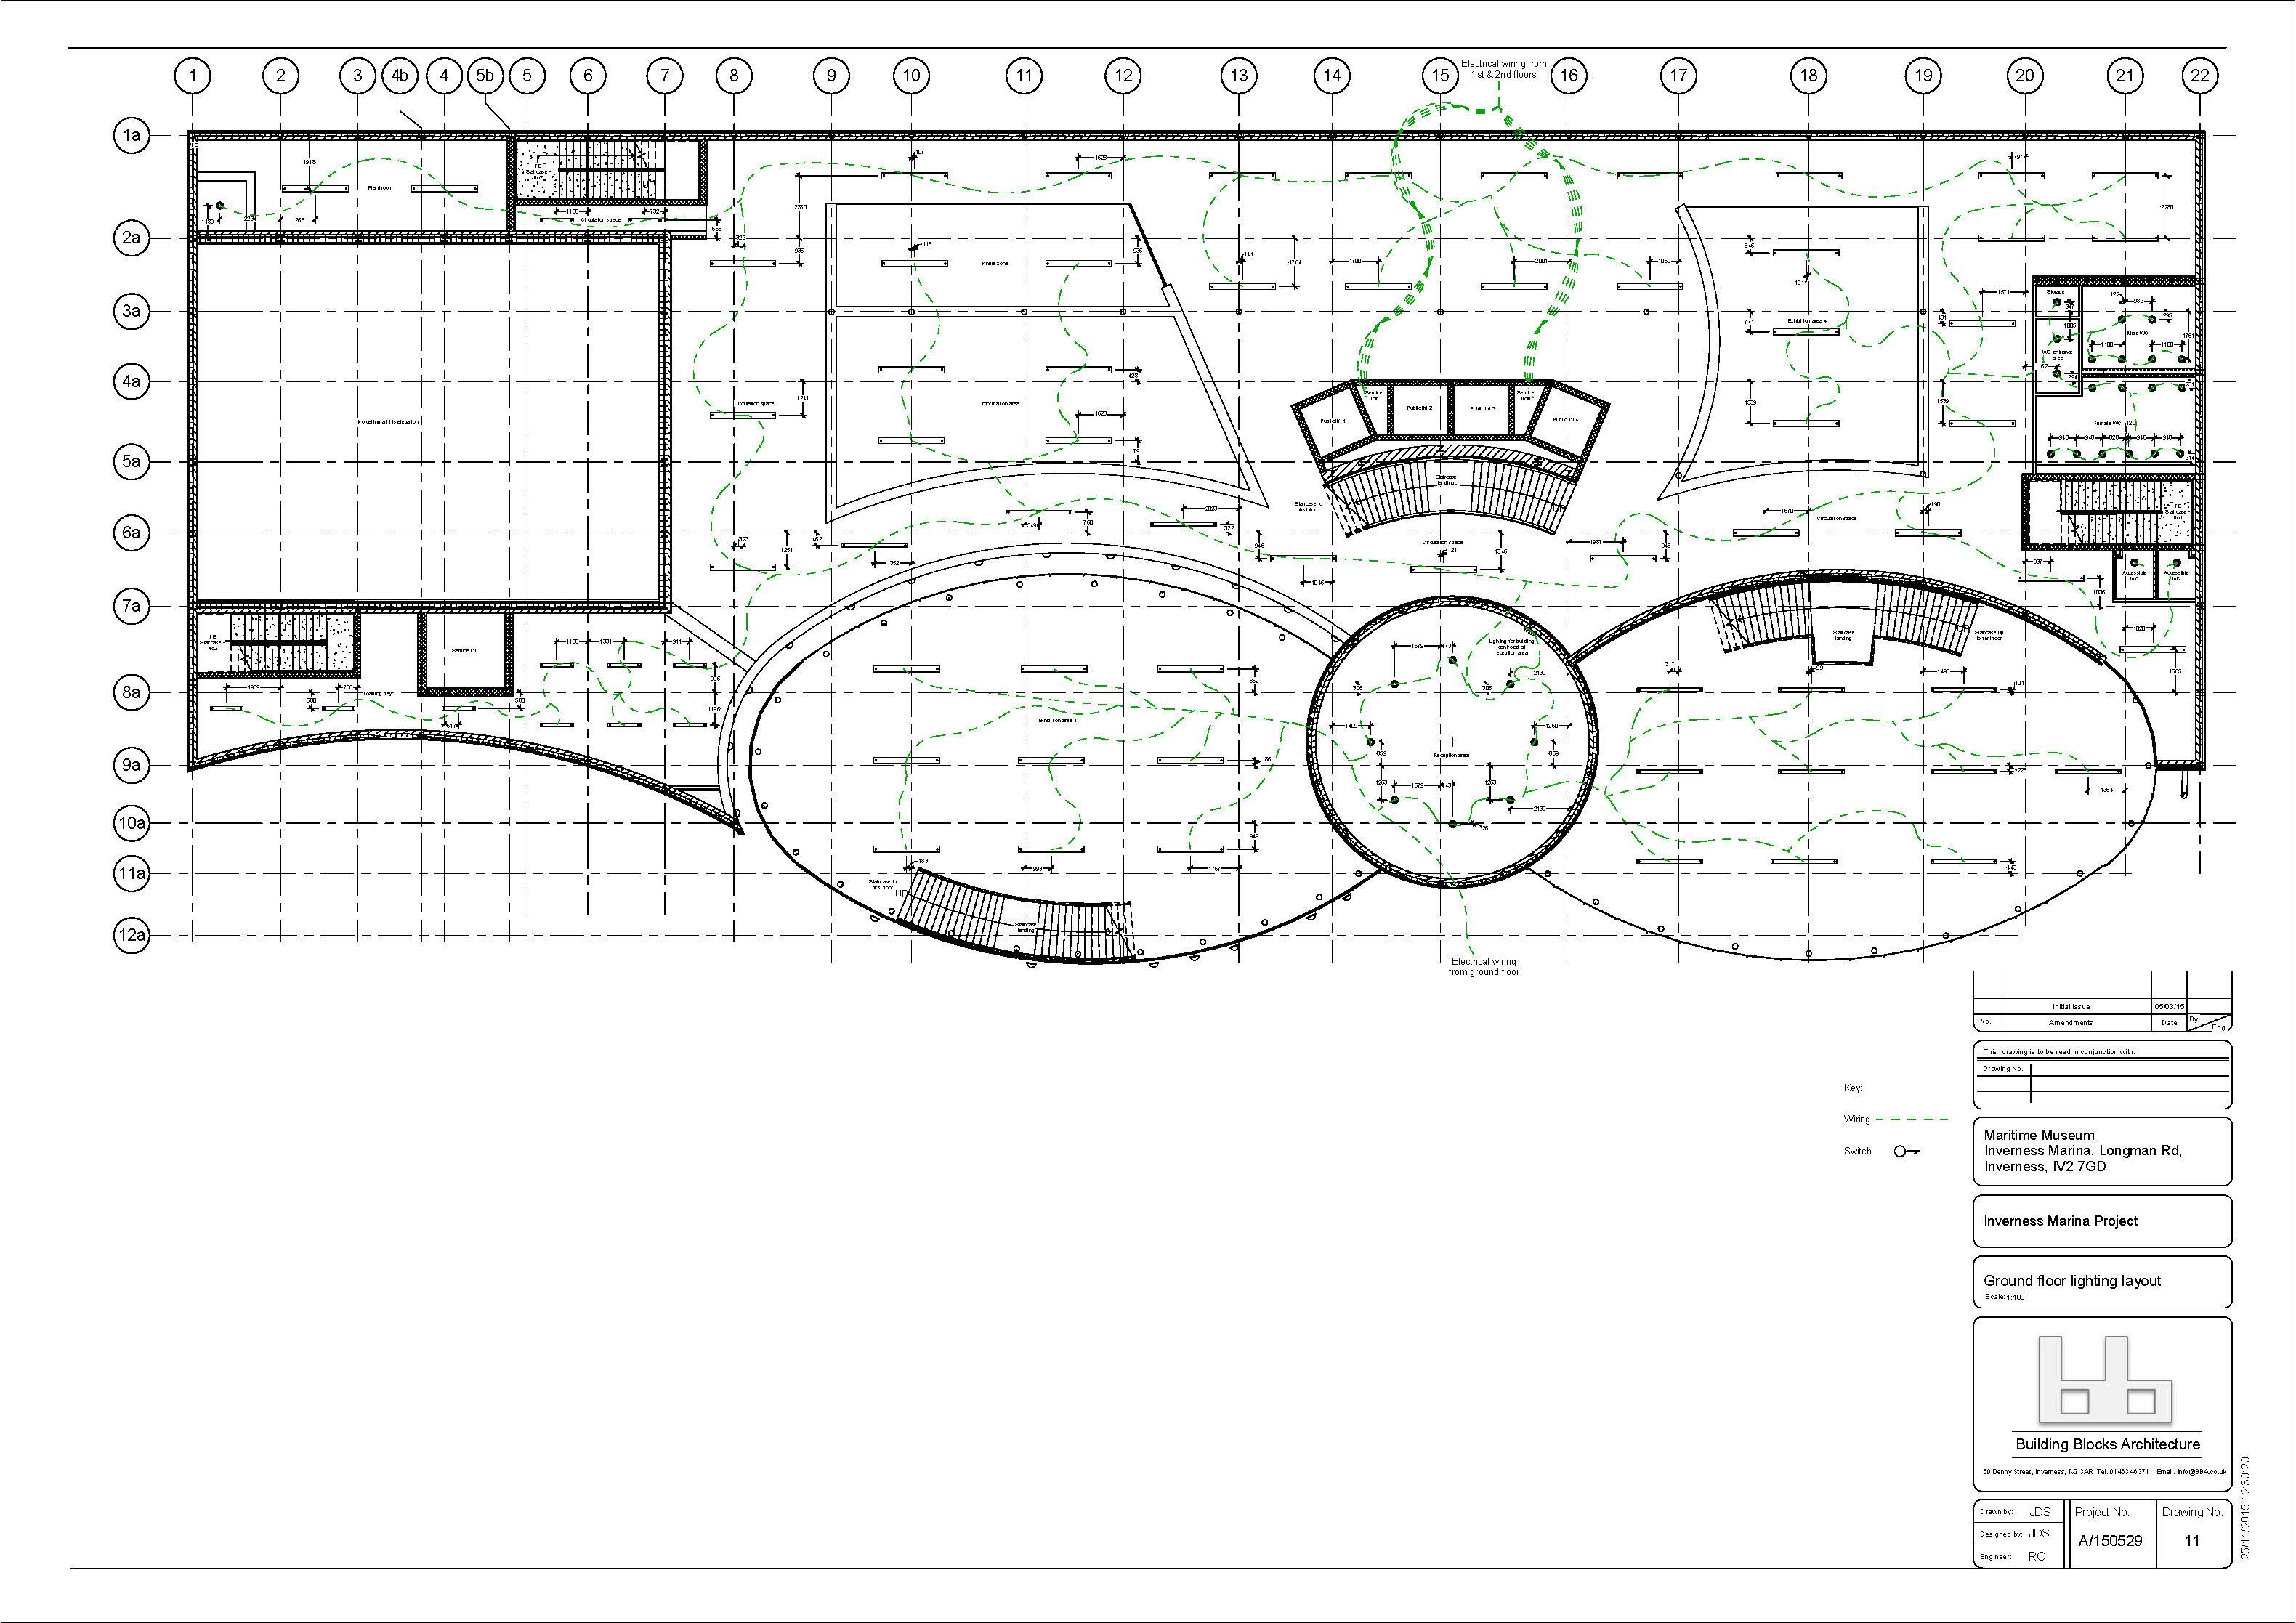 11---ground-floor-lighting-layout-3500-3500